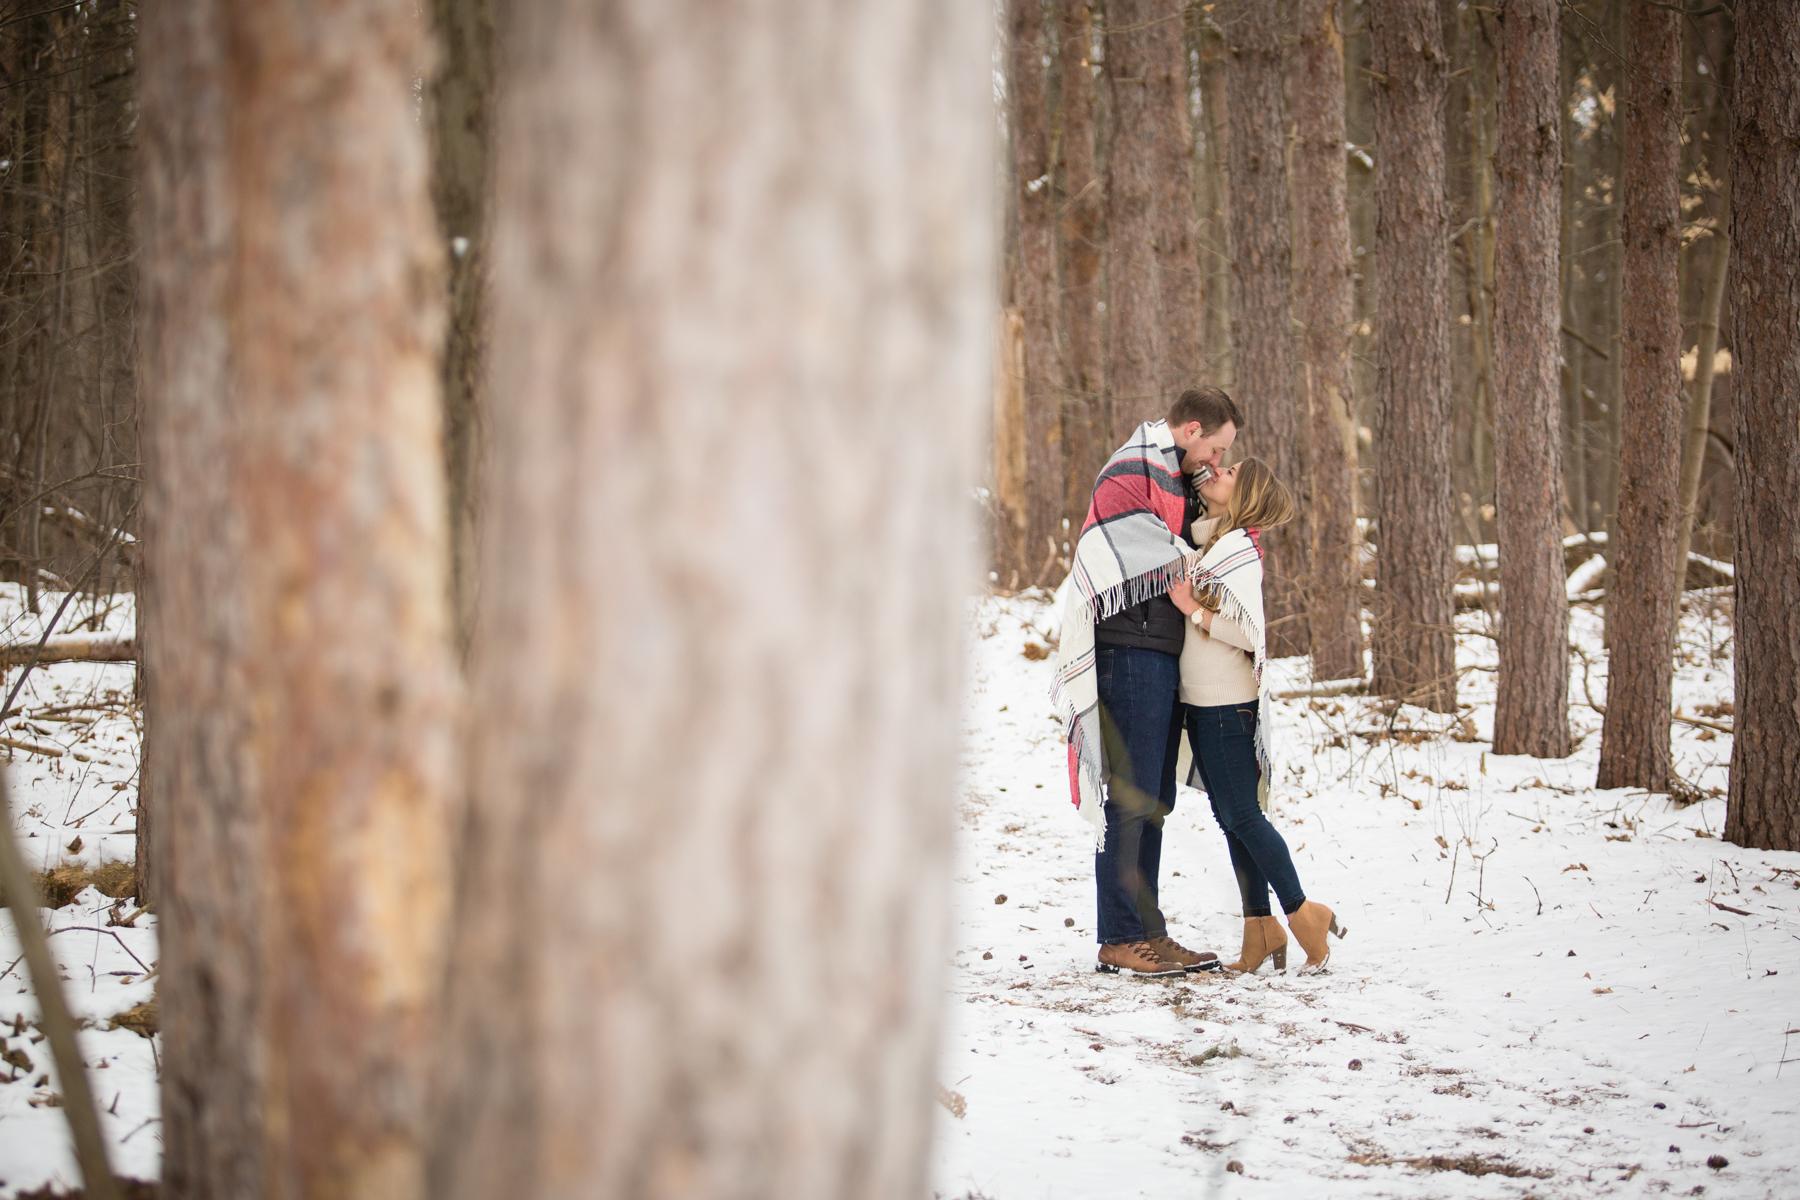 Doug&Kara_winter_Engagment_Photos_Brandon_Shafer_Photography_Blog-33.jpg